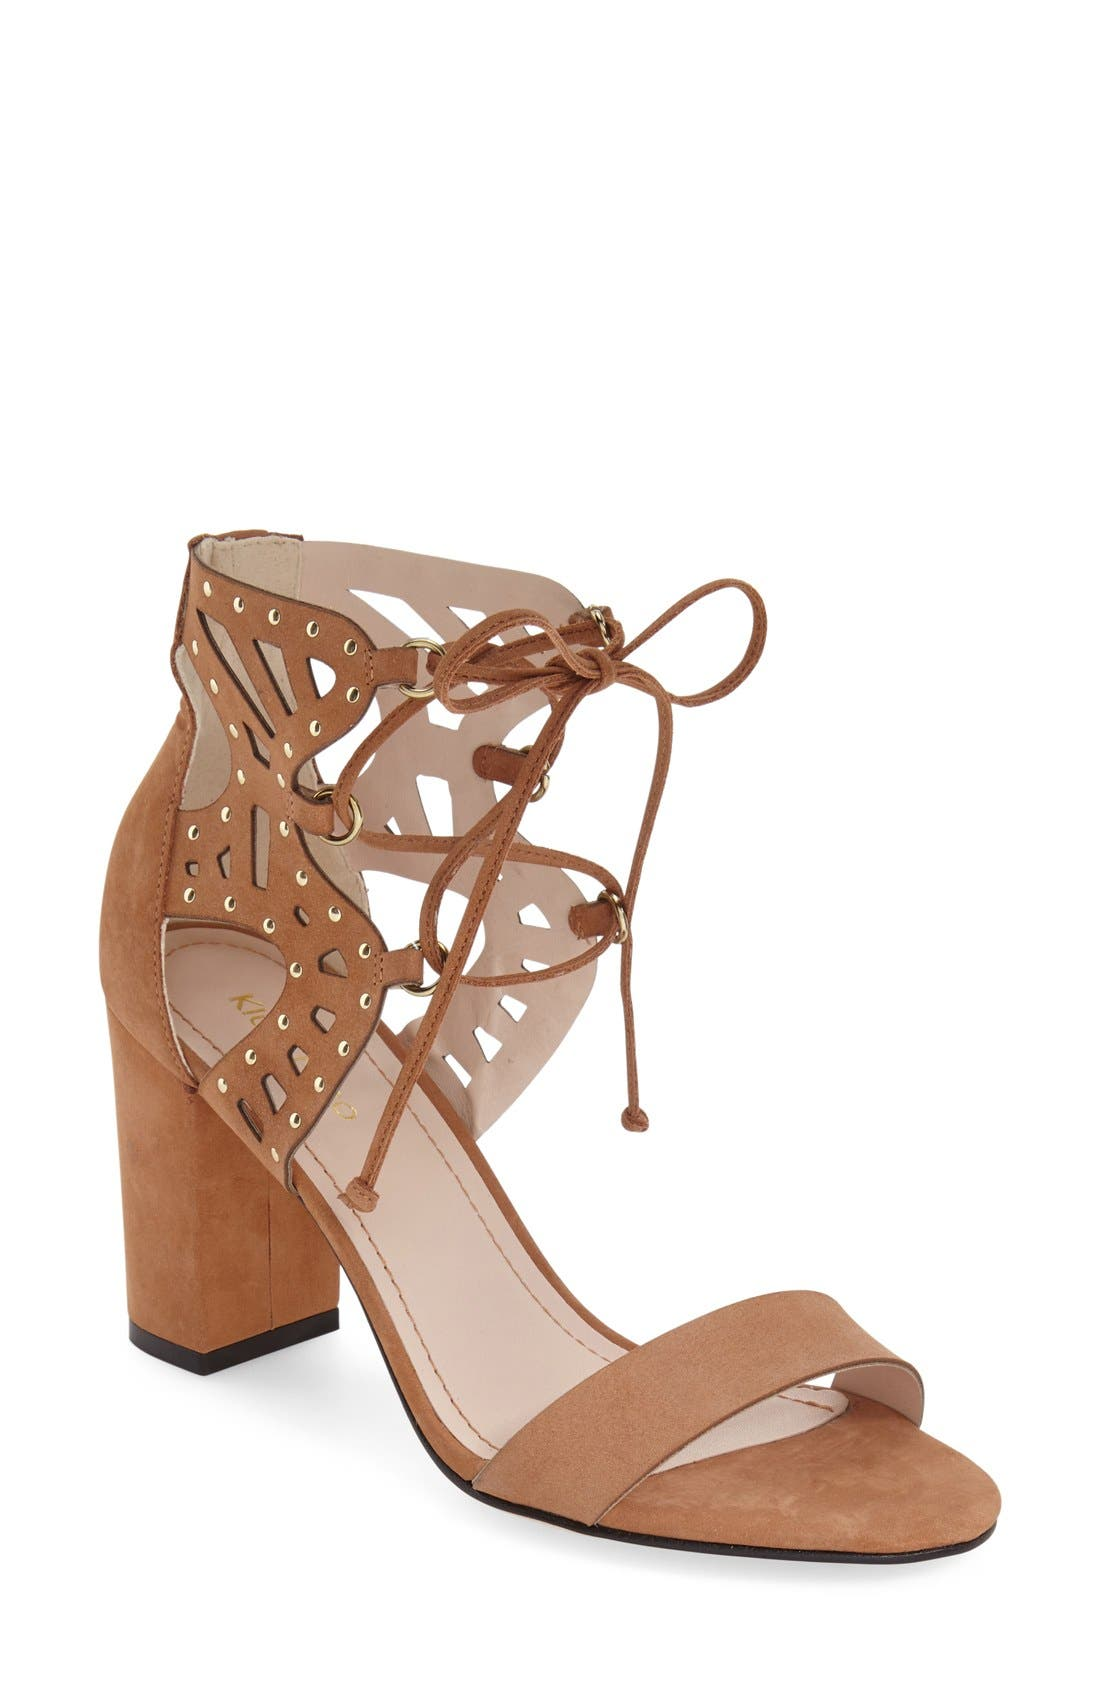 Main Image - Klub Nico 'Tarina' Gladiator Sandal (Women)